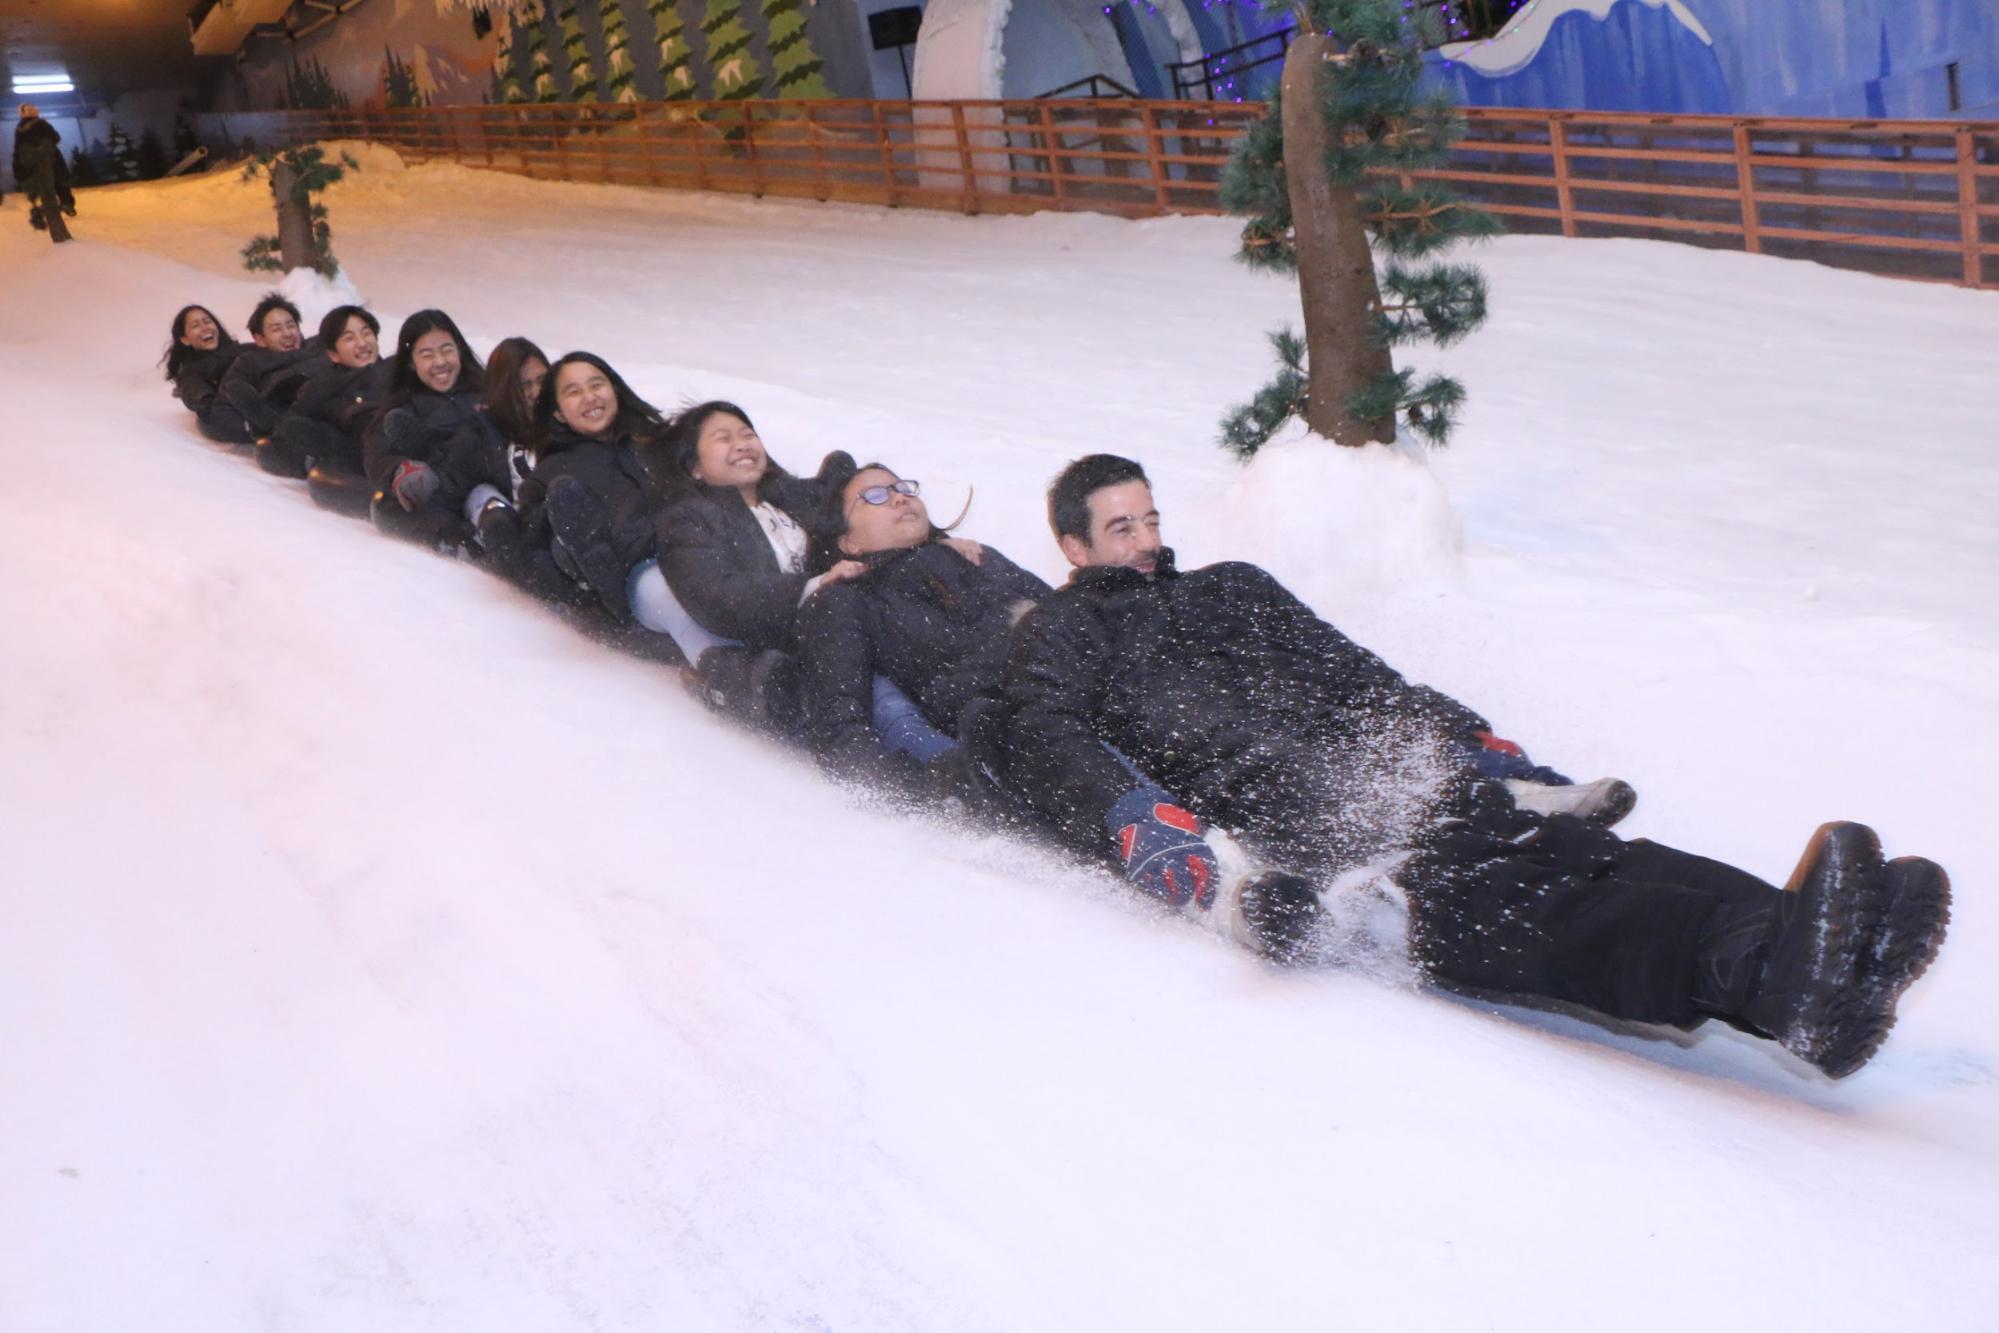 Snow City snow slopes